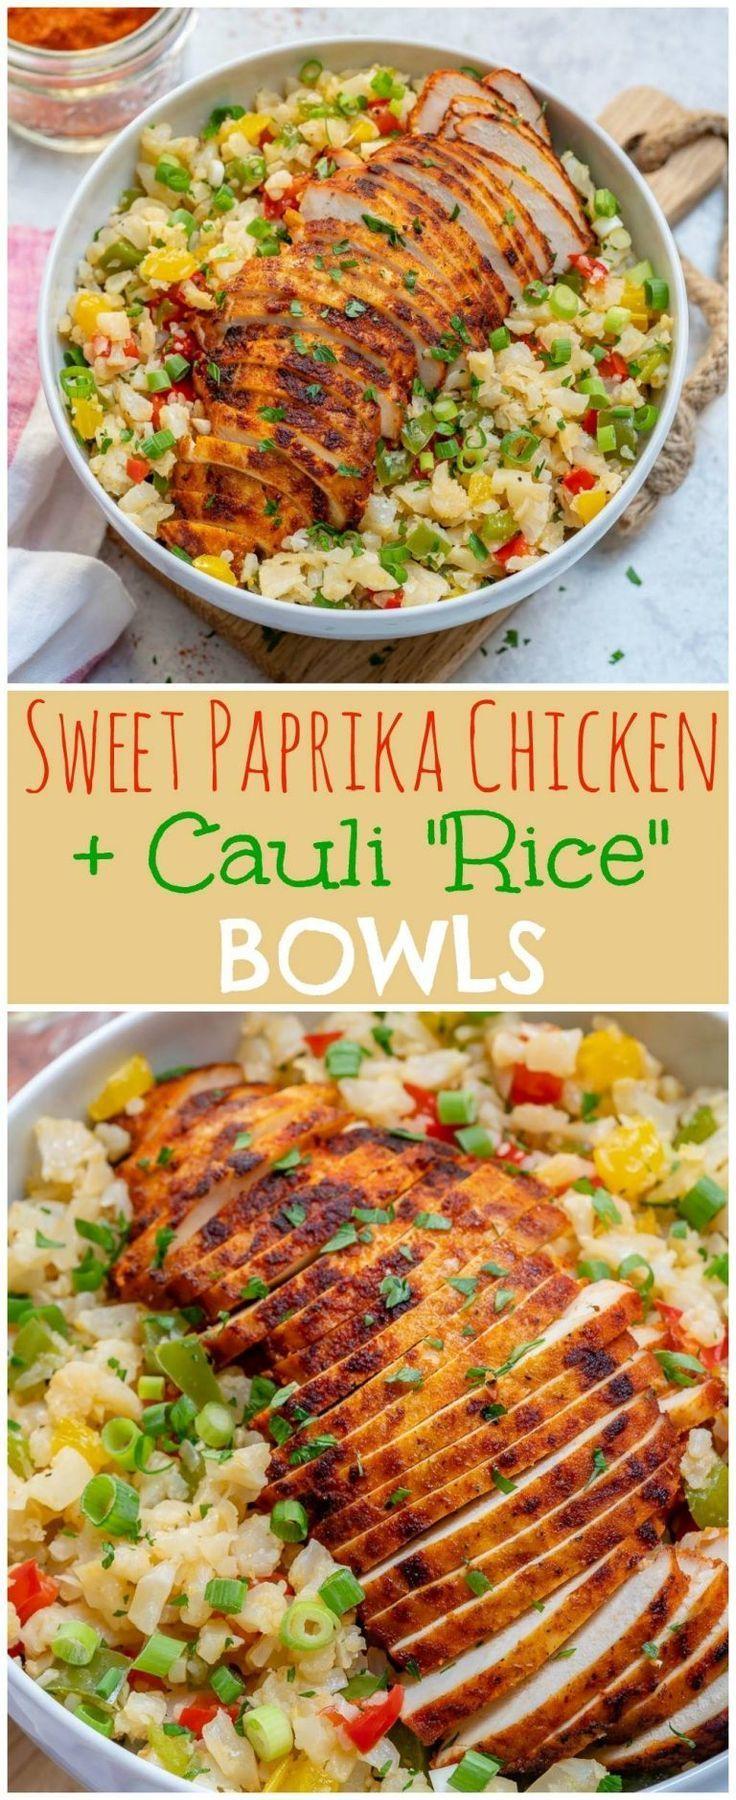 Sweet Paprika Chicken + Cauli Rice Bowls #cleaneating